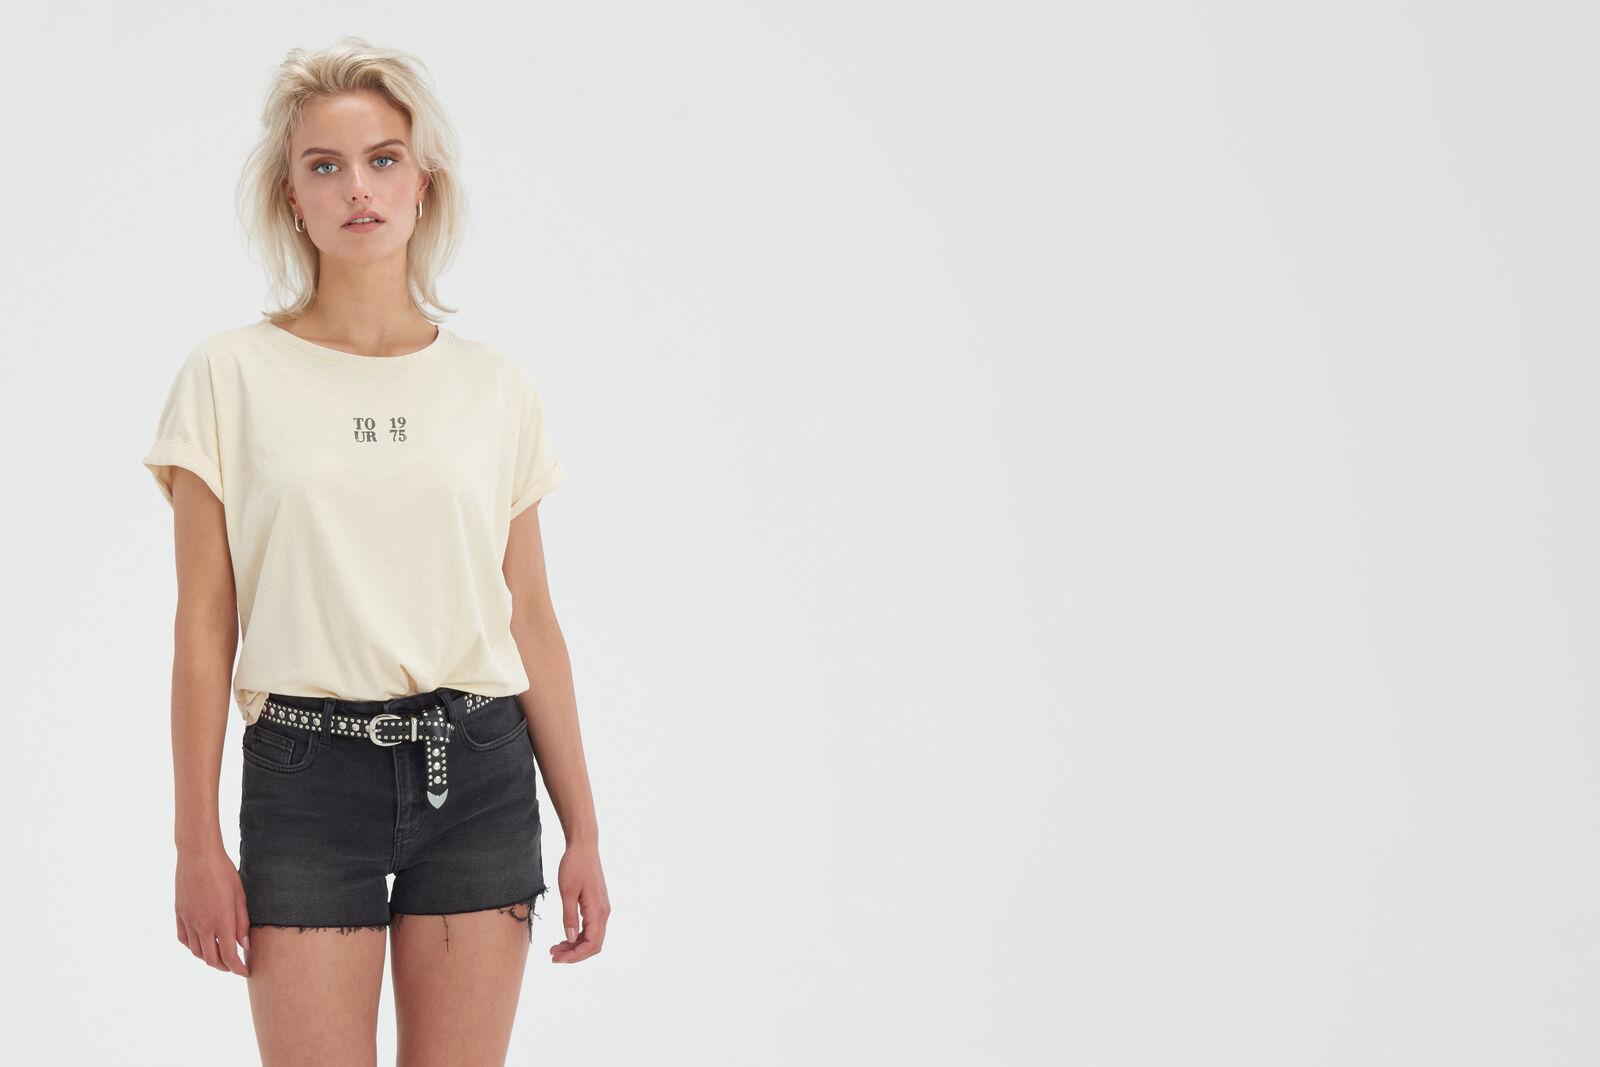 Revolve T-shirt